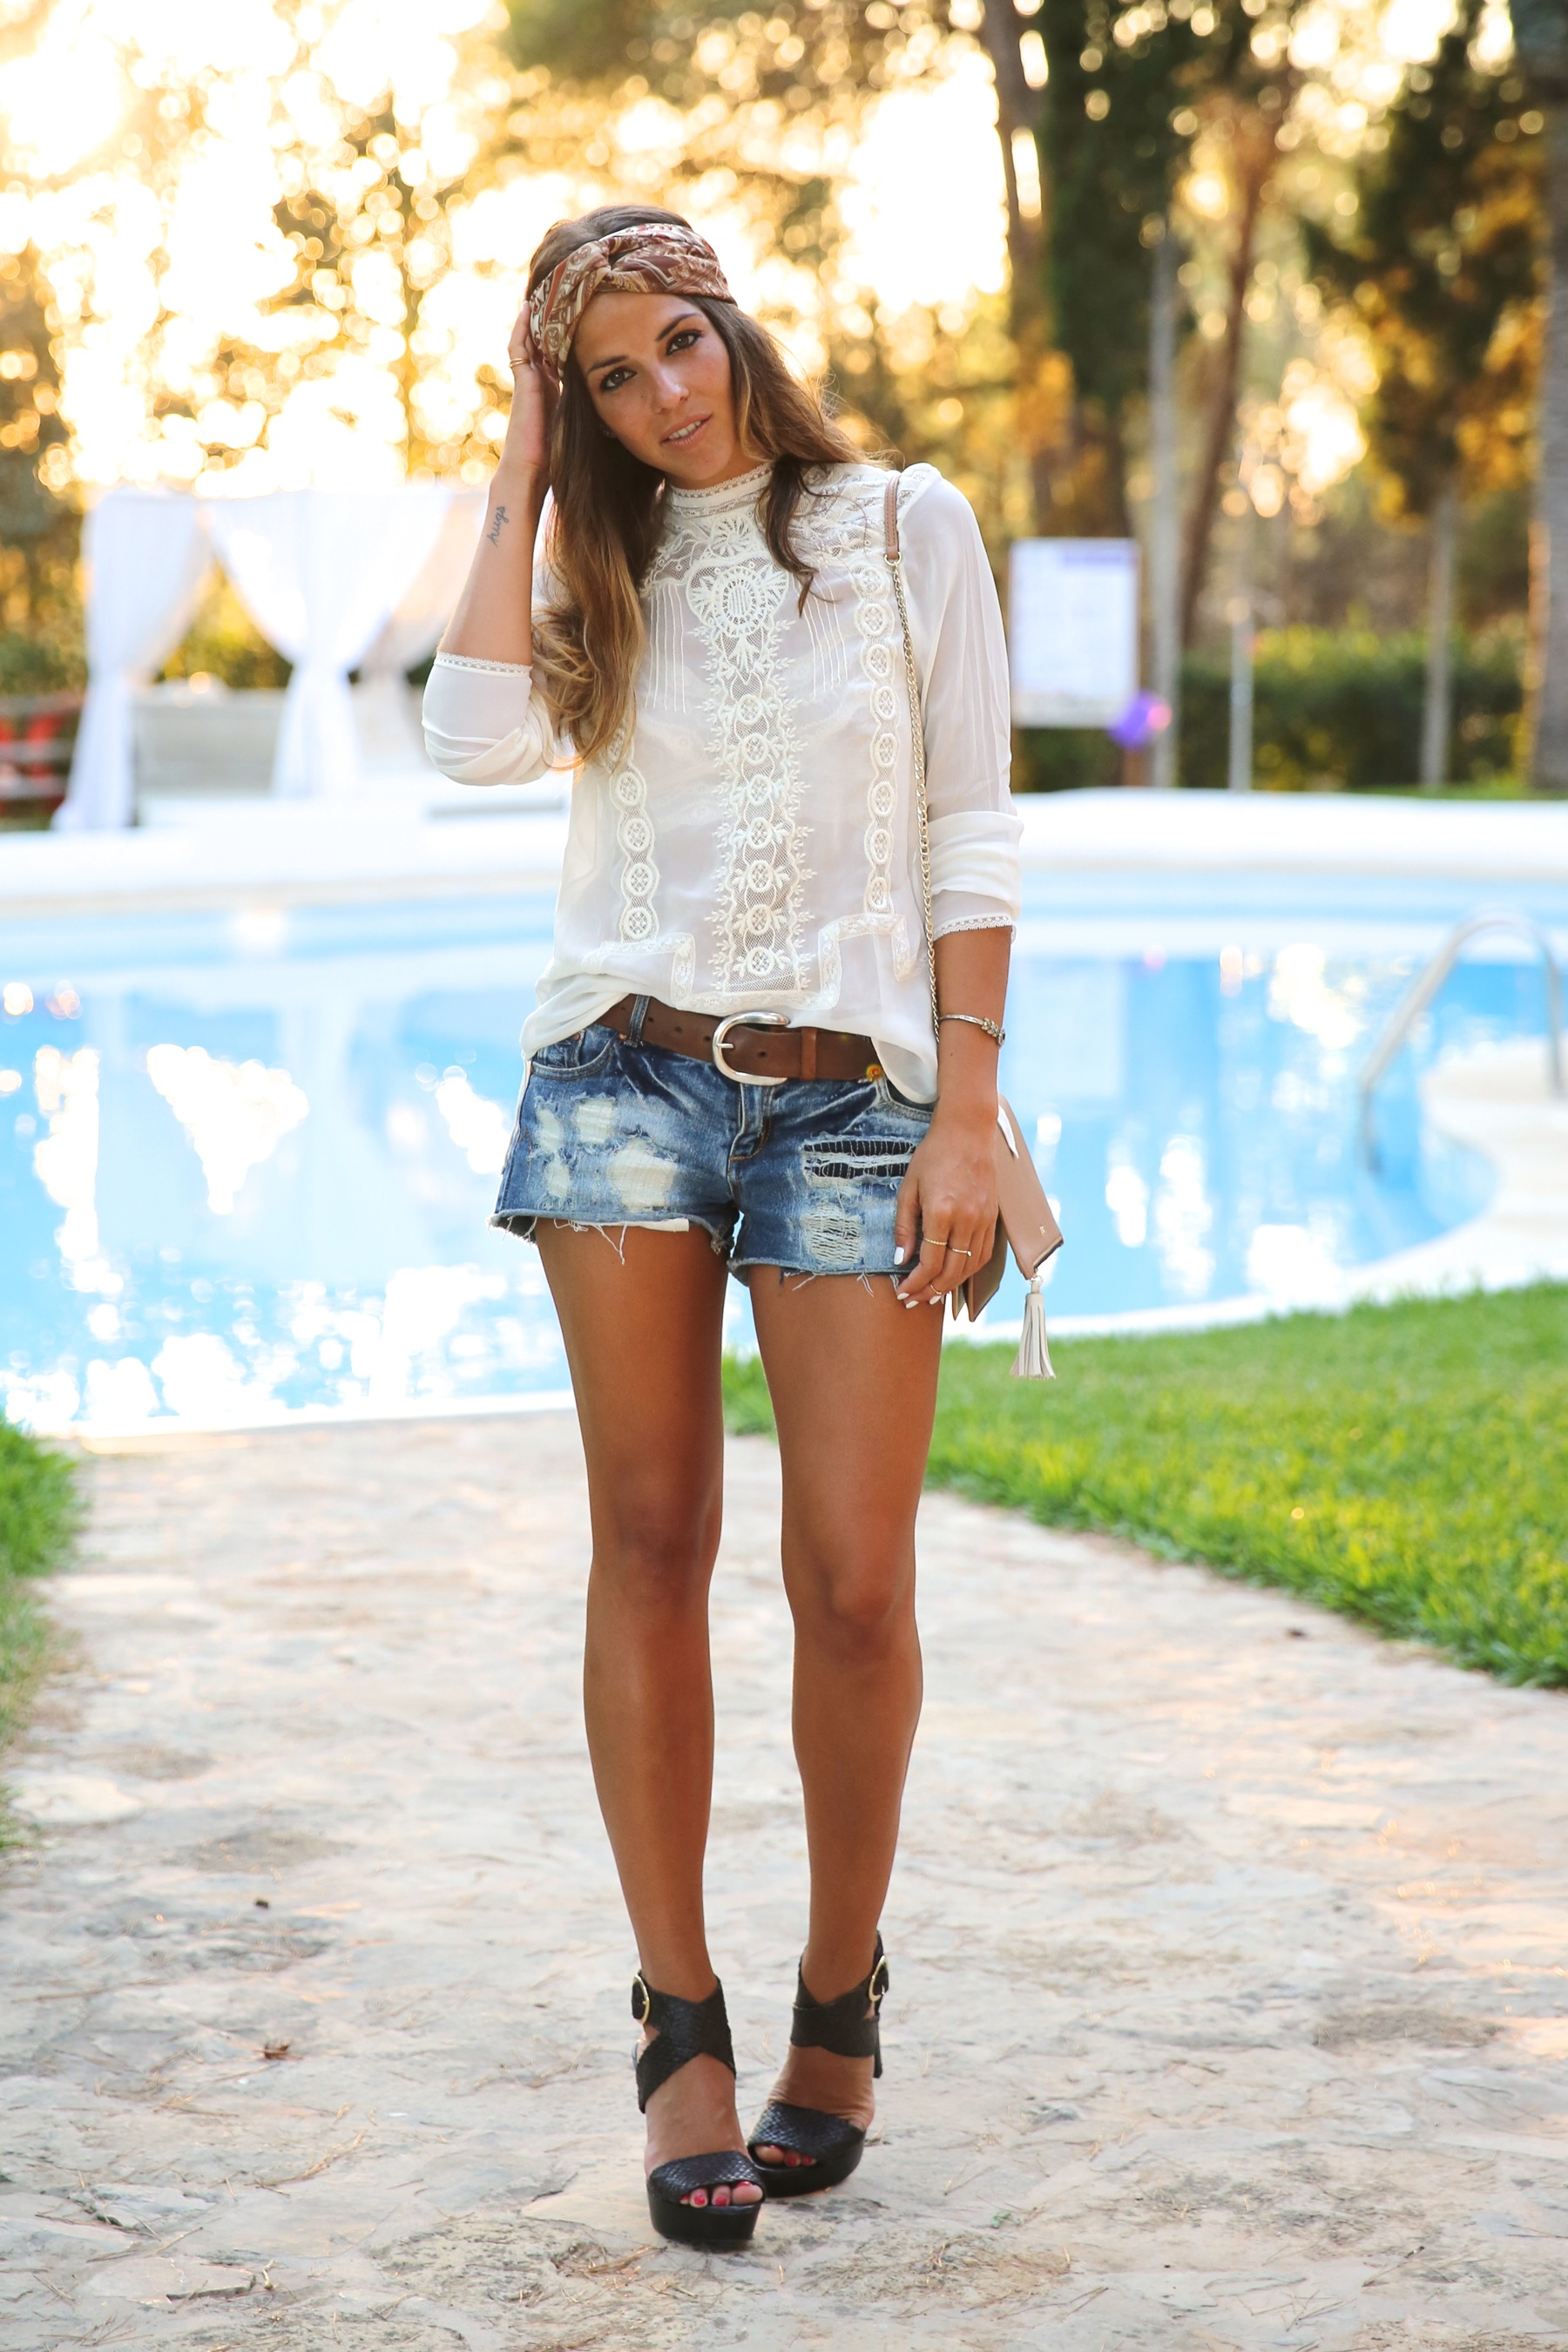 trendy_taste-look-outfit-street_style-ootd-blog-blogger-fashion_spain-moda_españa-boho-hippie-denim_shorts-shorts_vaqueros-blusa-blouse-mas34-pg-ibiza-sa_talaia-9